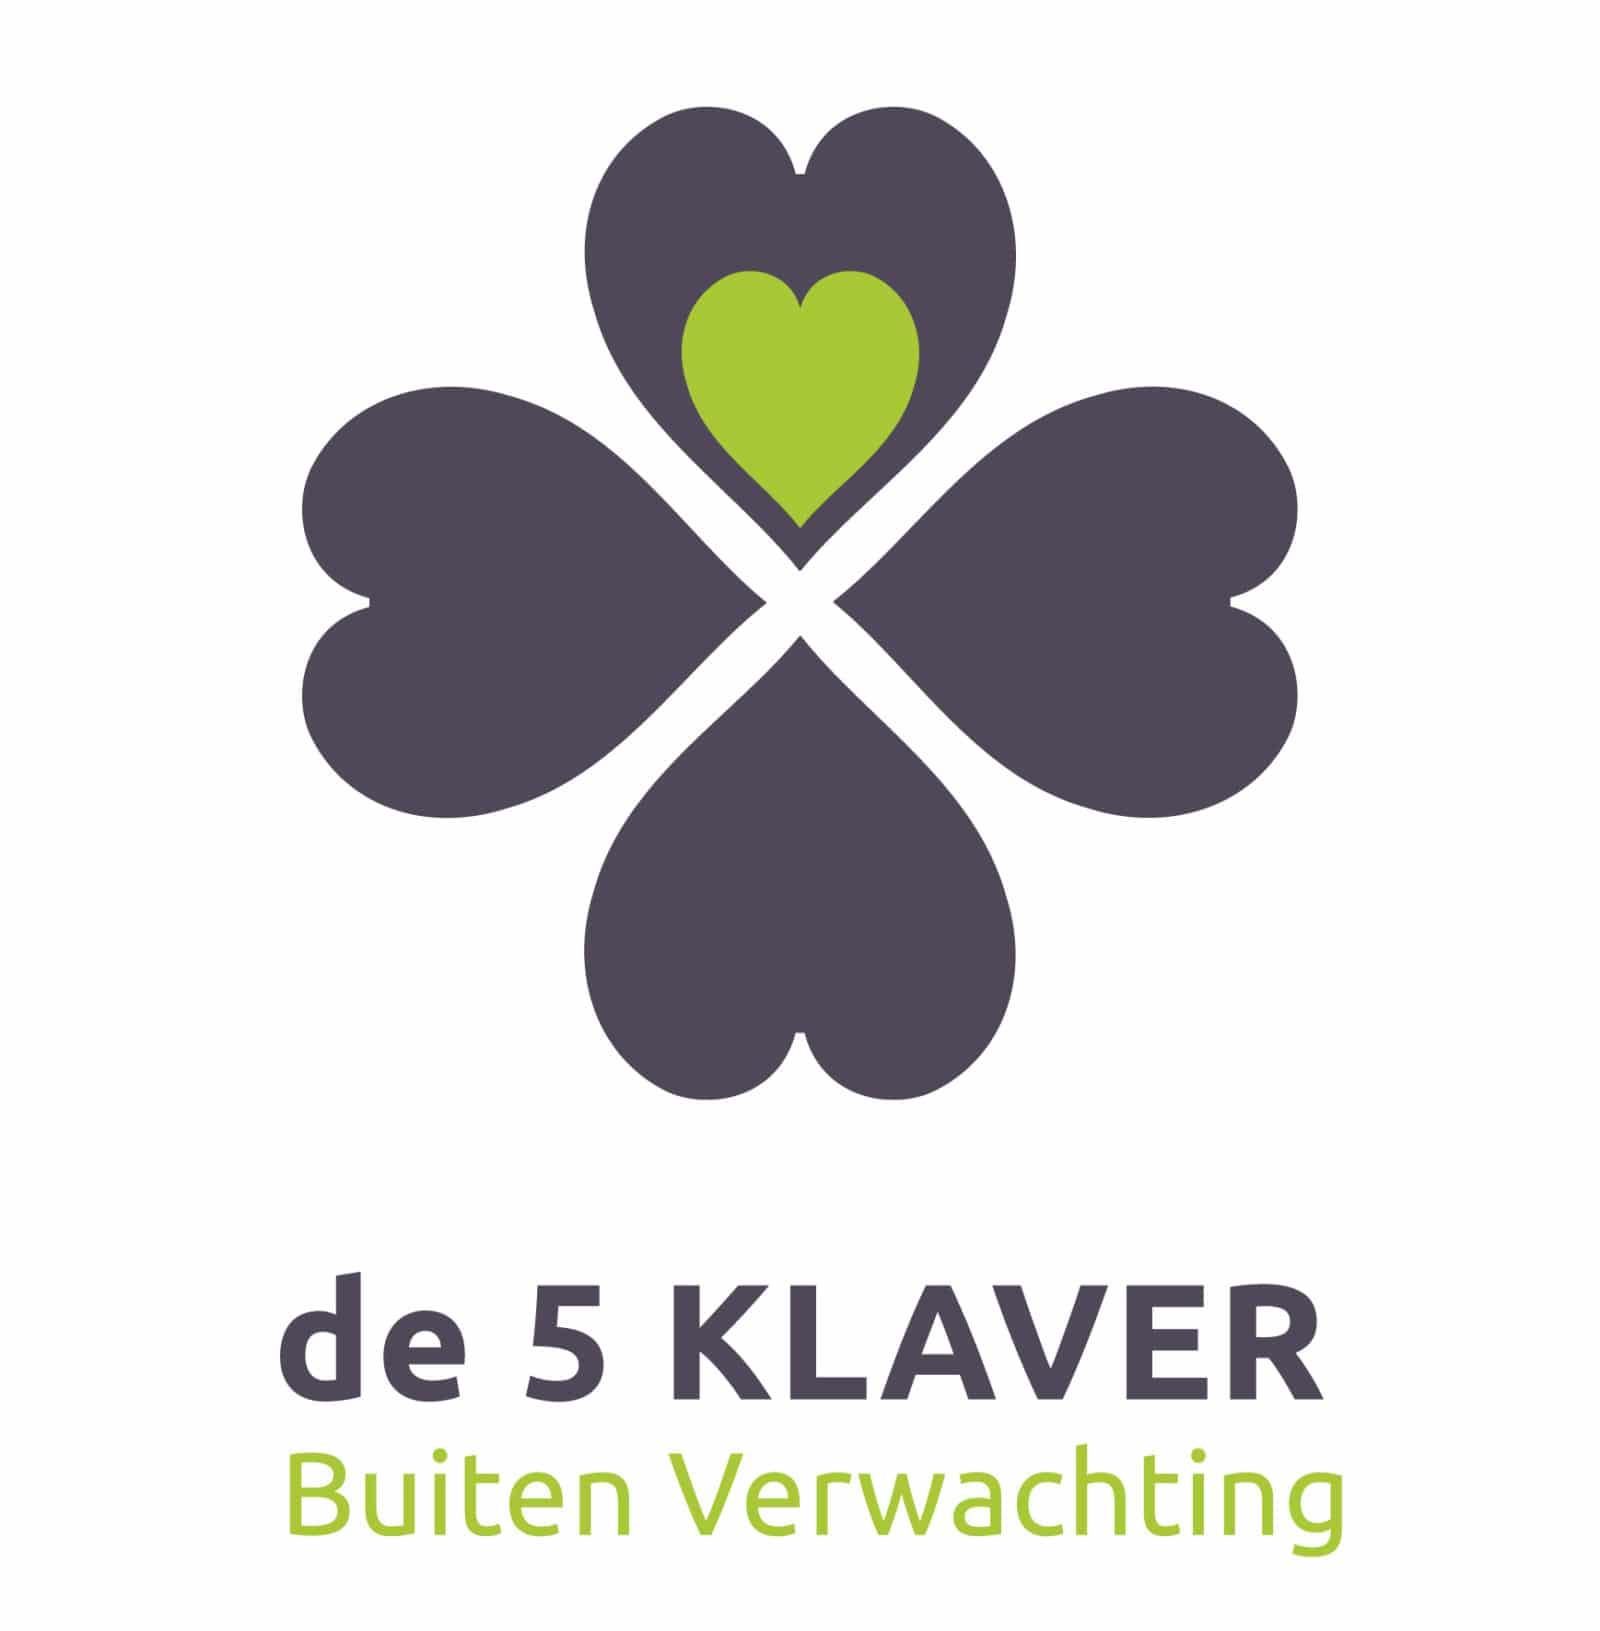 de5klaver logo_centr_basel_RGB_new